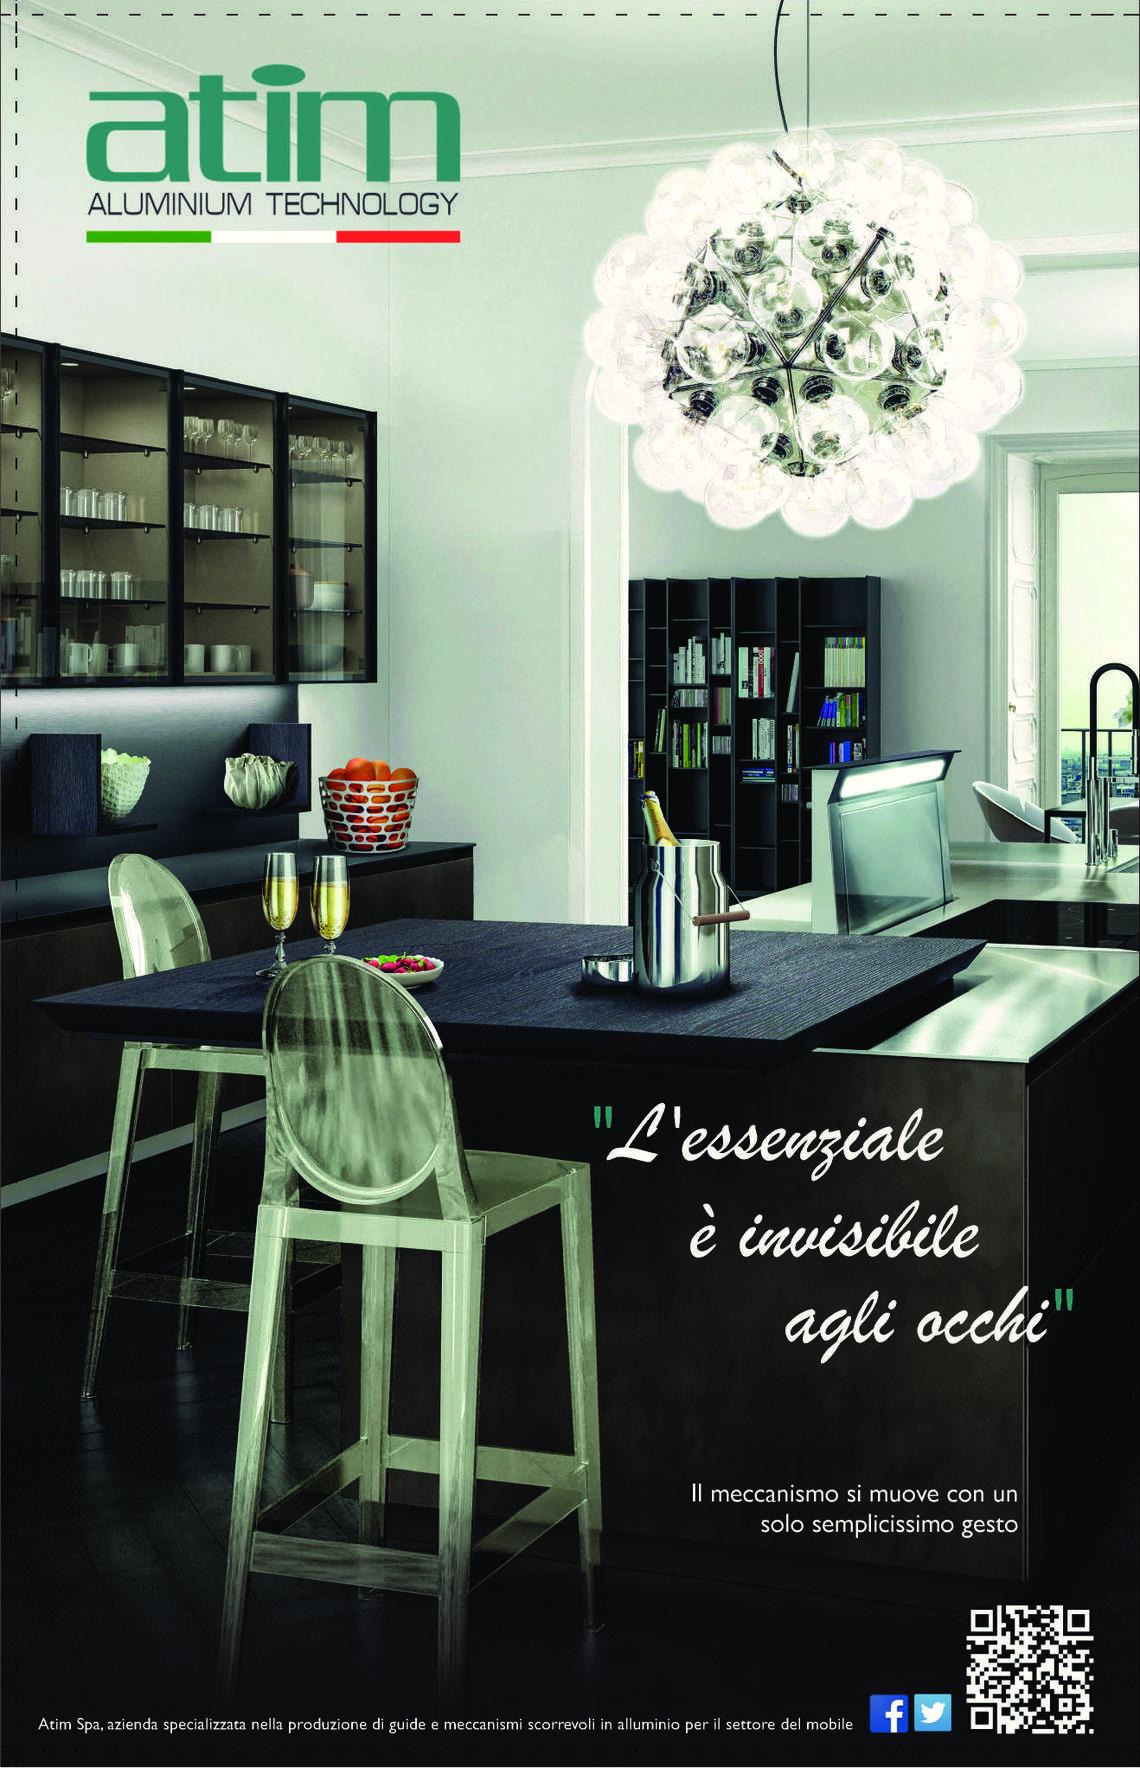 furnishing-idea-journal--1-2018_journal_9_001.jpg